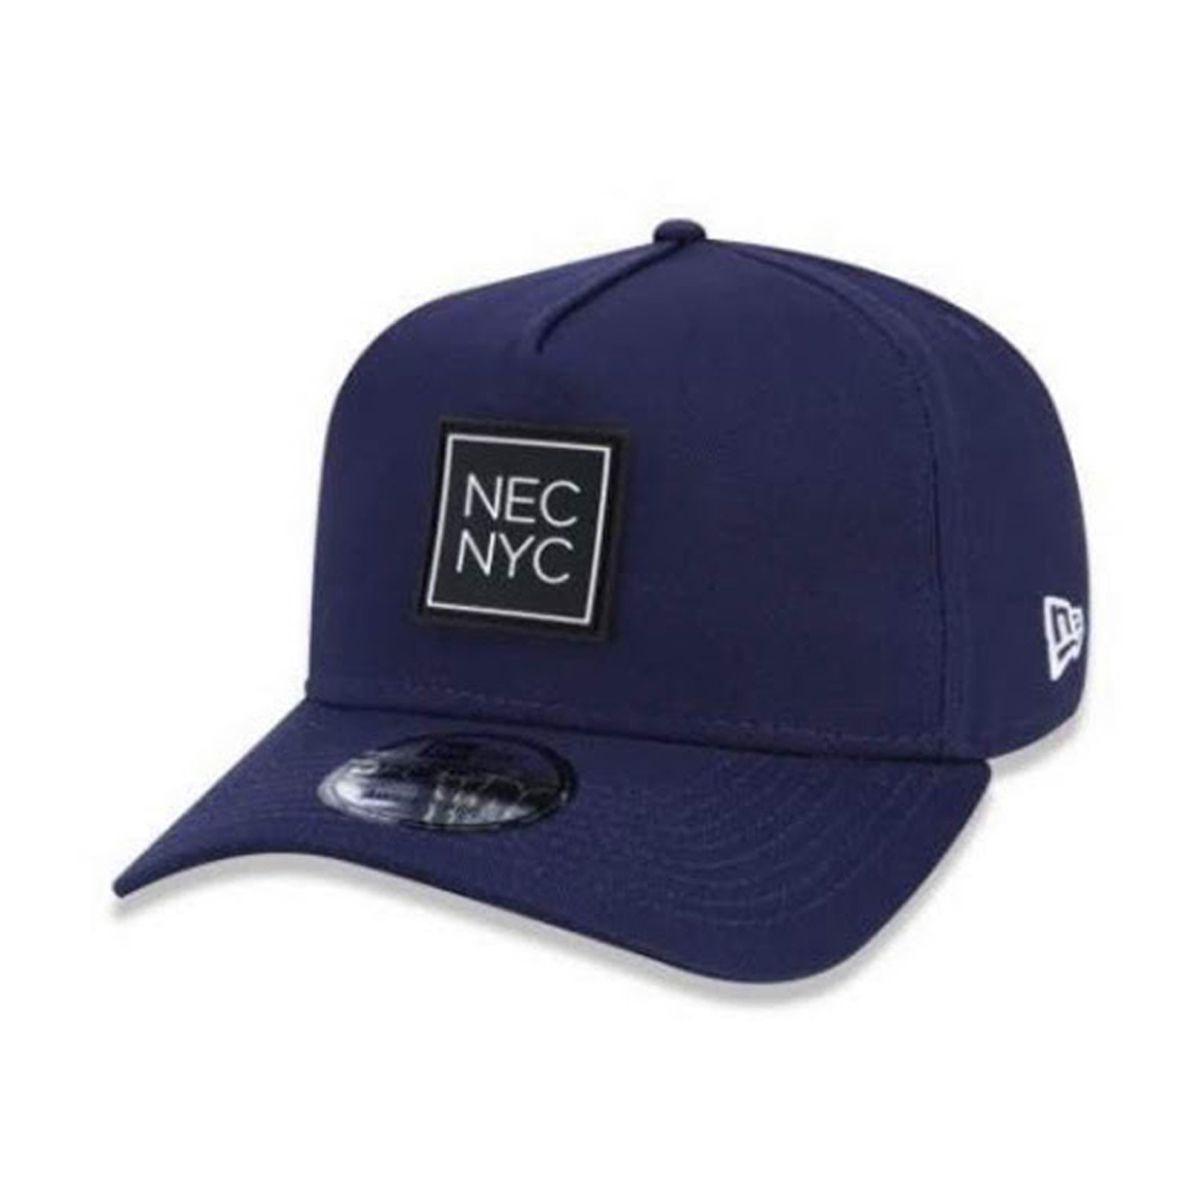 Boné New Era Masculino NEC NYC Azul Marinho